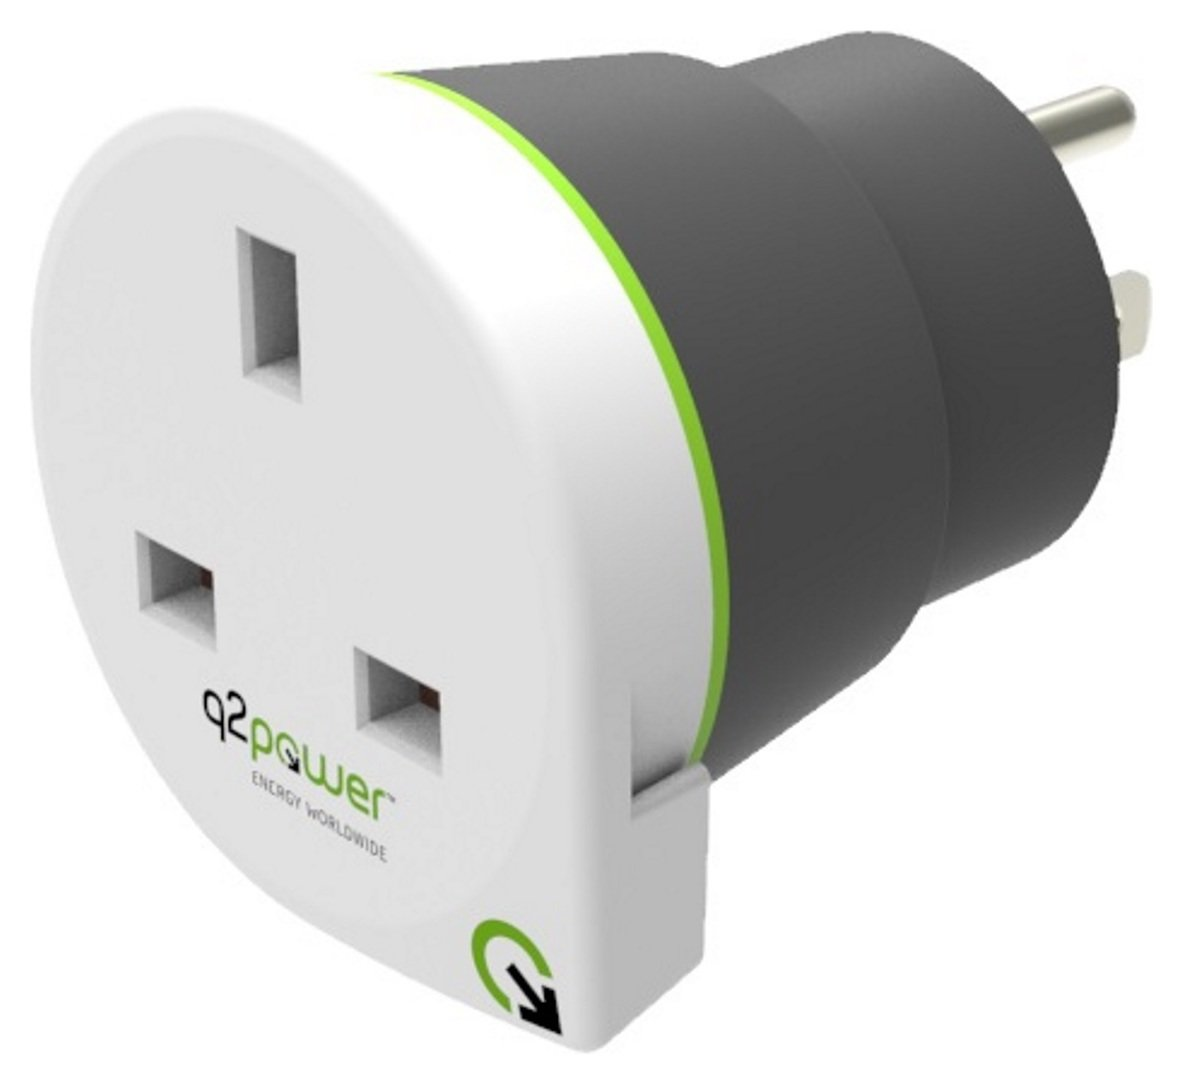 Mini Global Travel Adapter